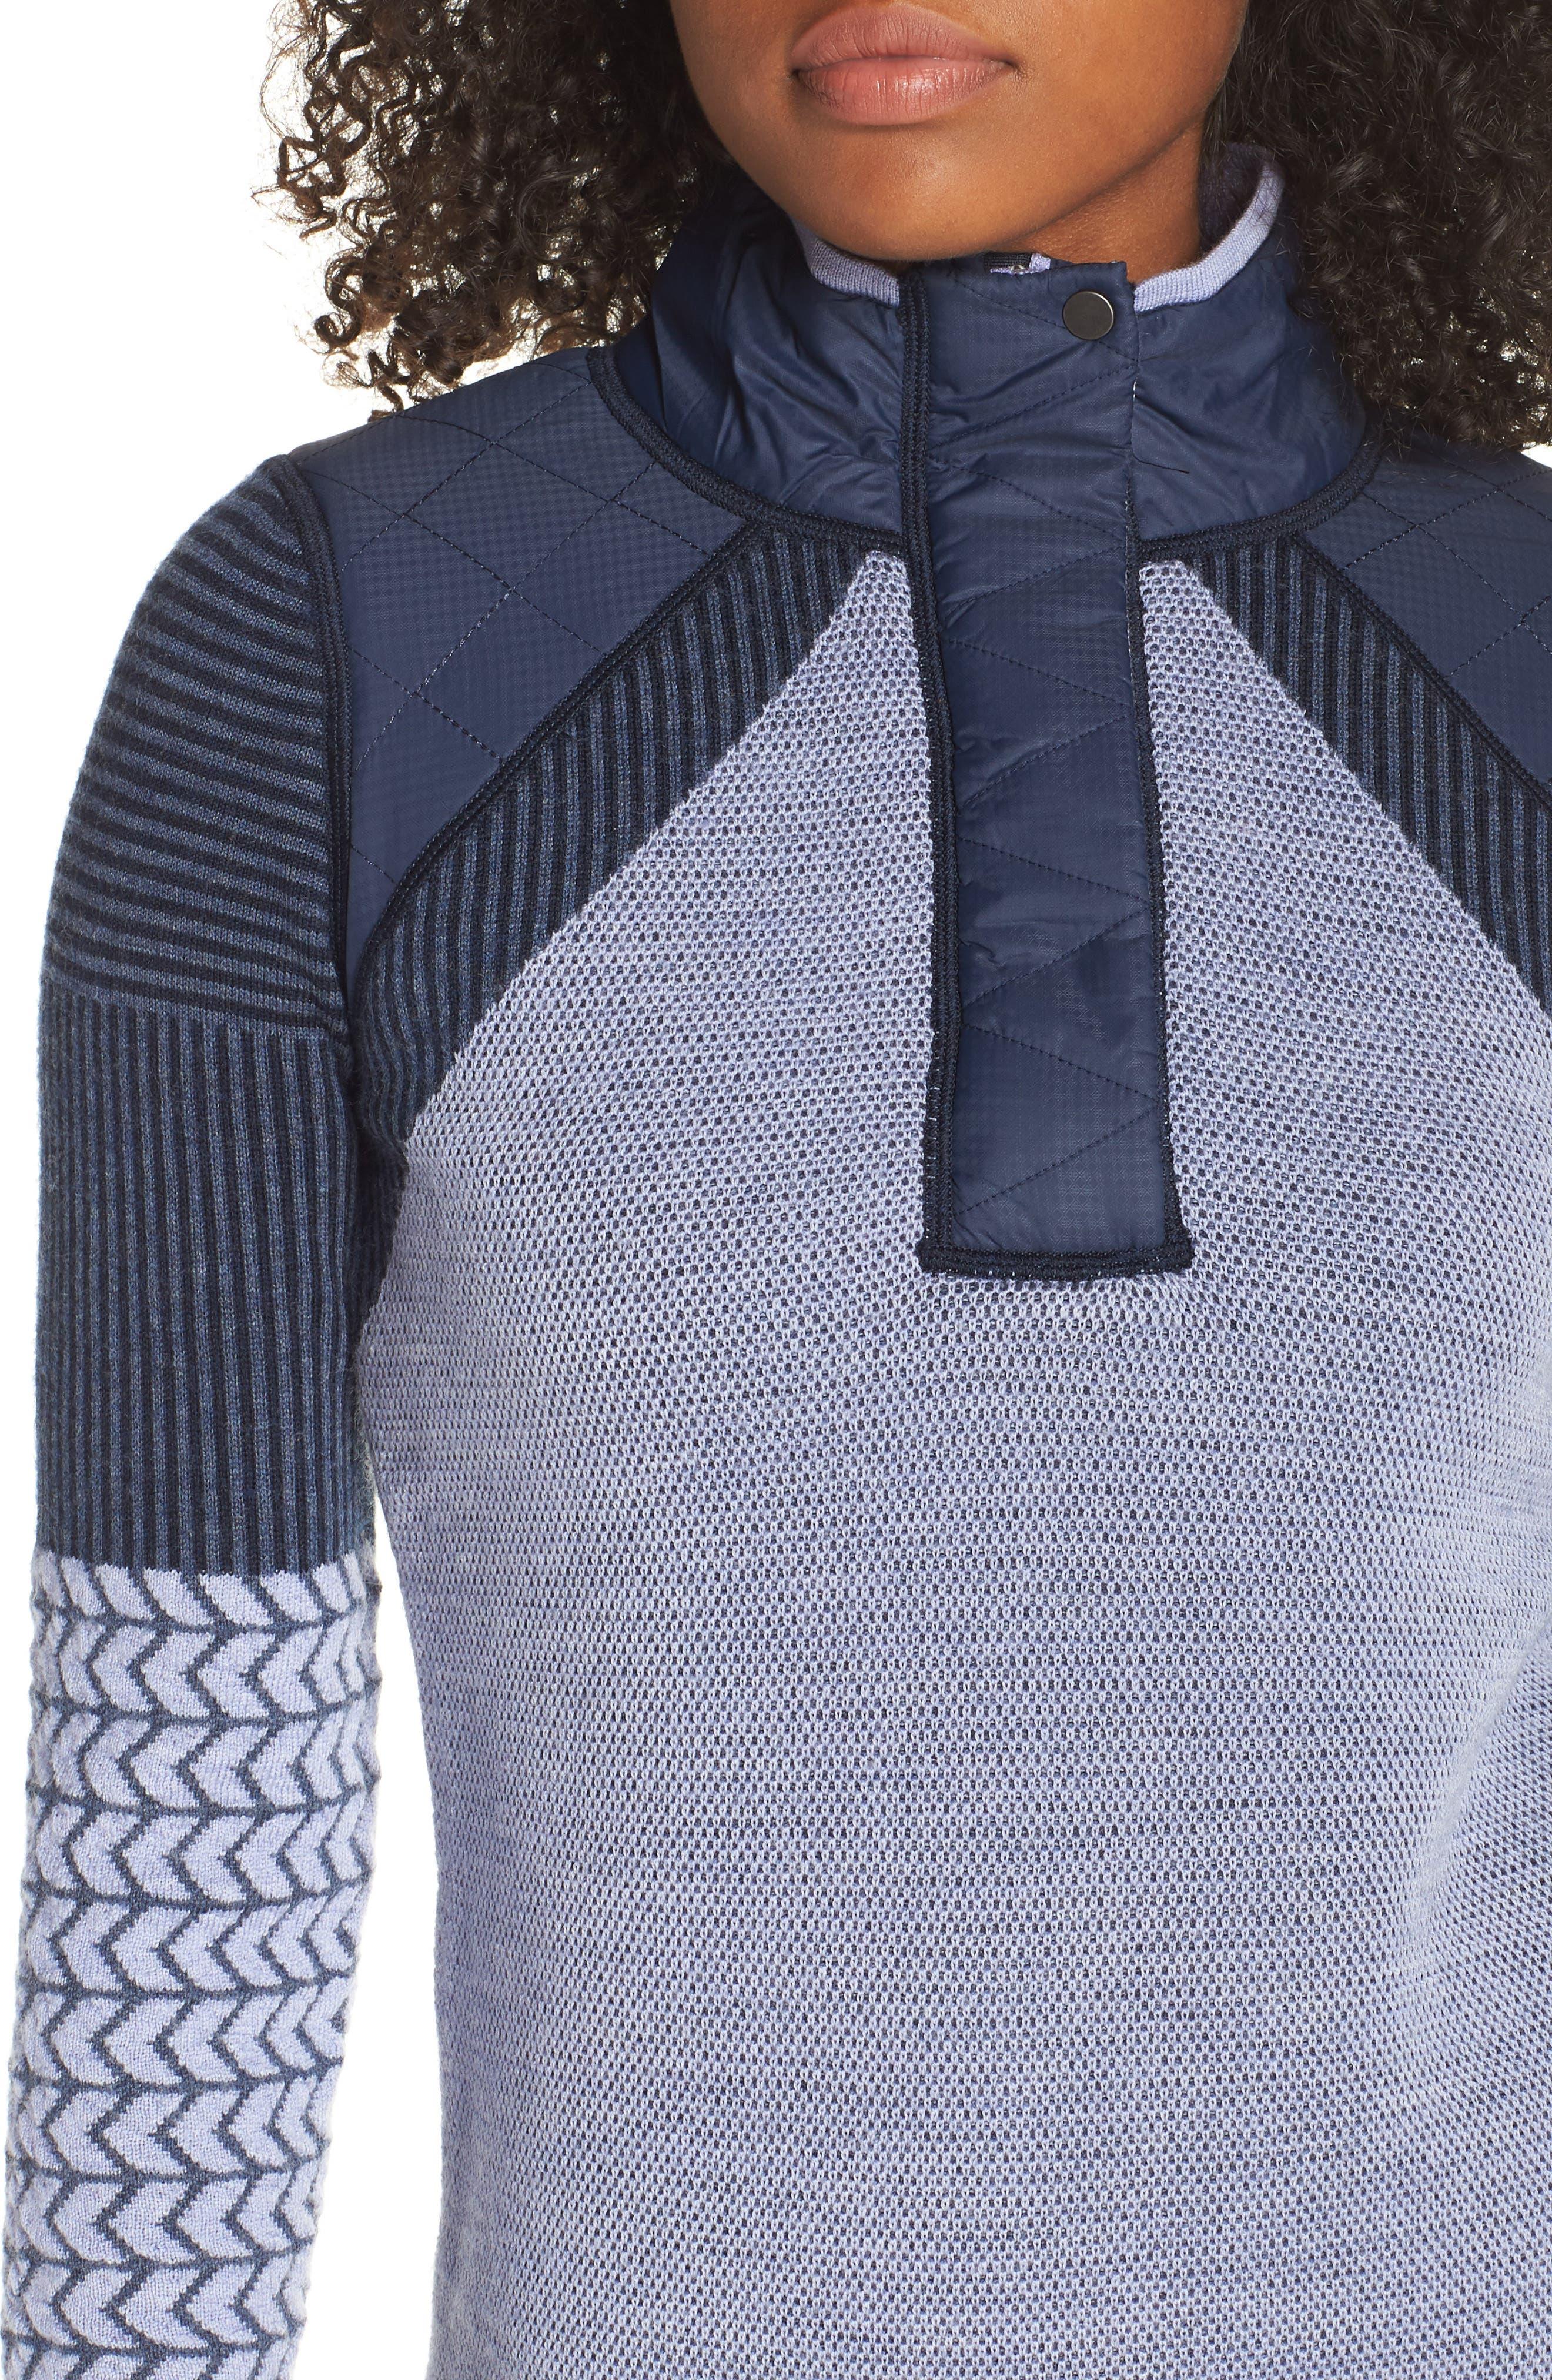 Ski Ninja Pullover Sweater,                             Alternate thumbnail 4, color,                             410